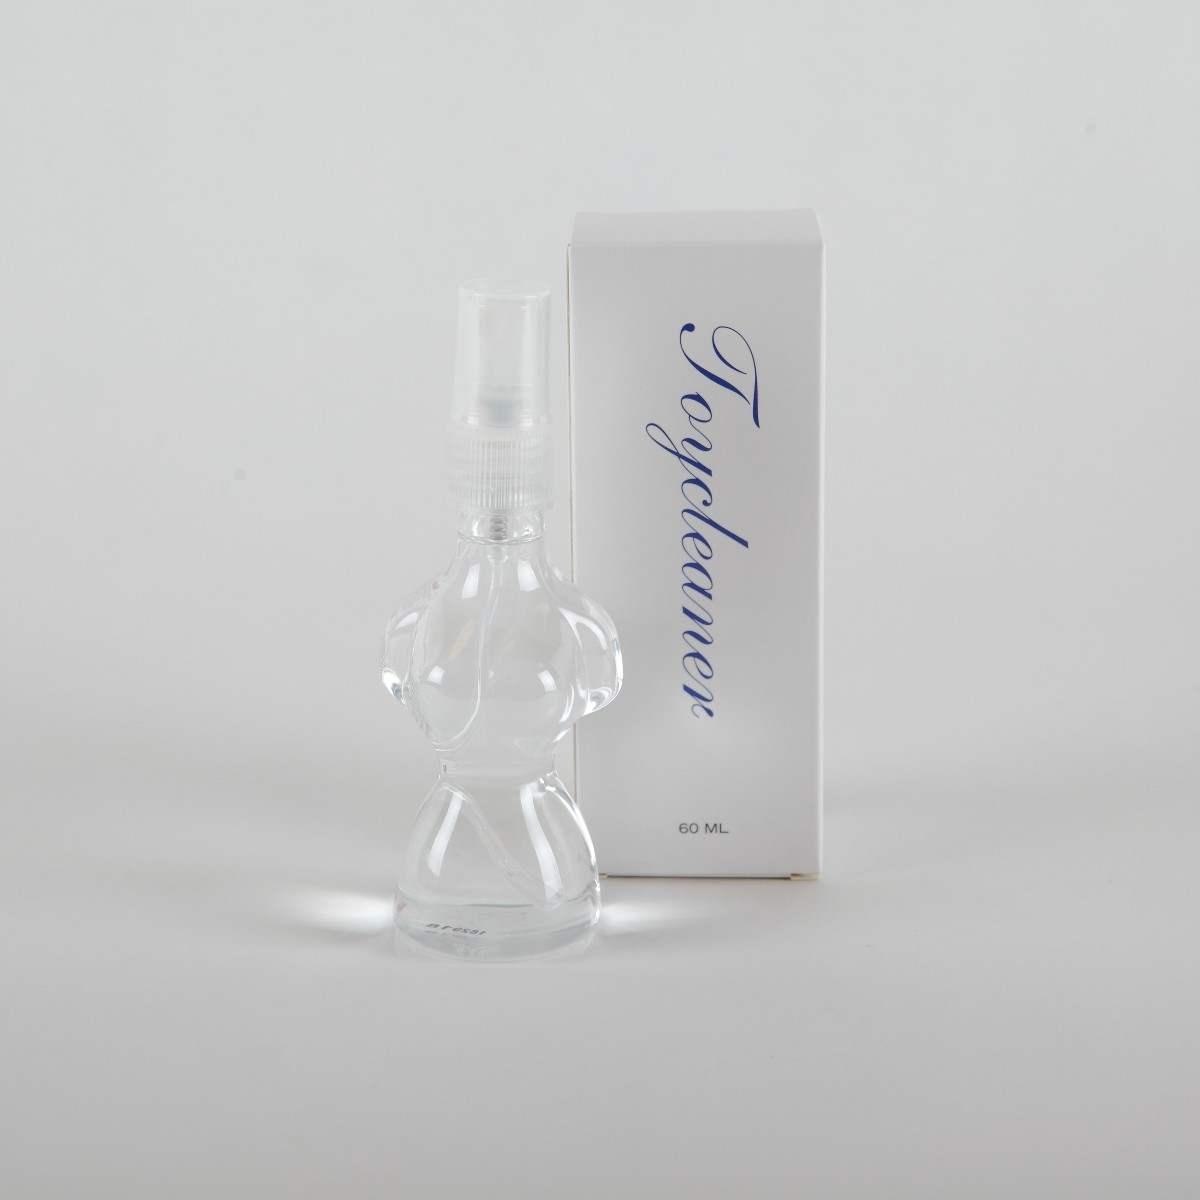 Toycleaner 60 ml